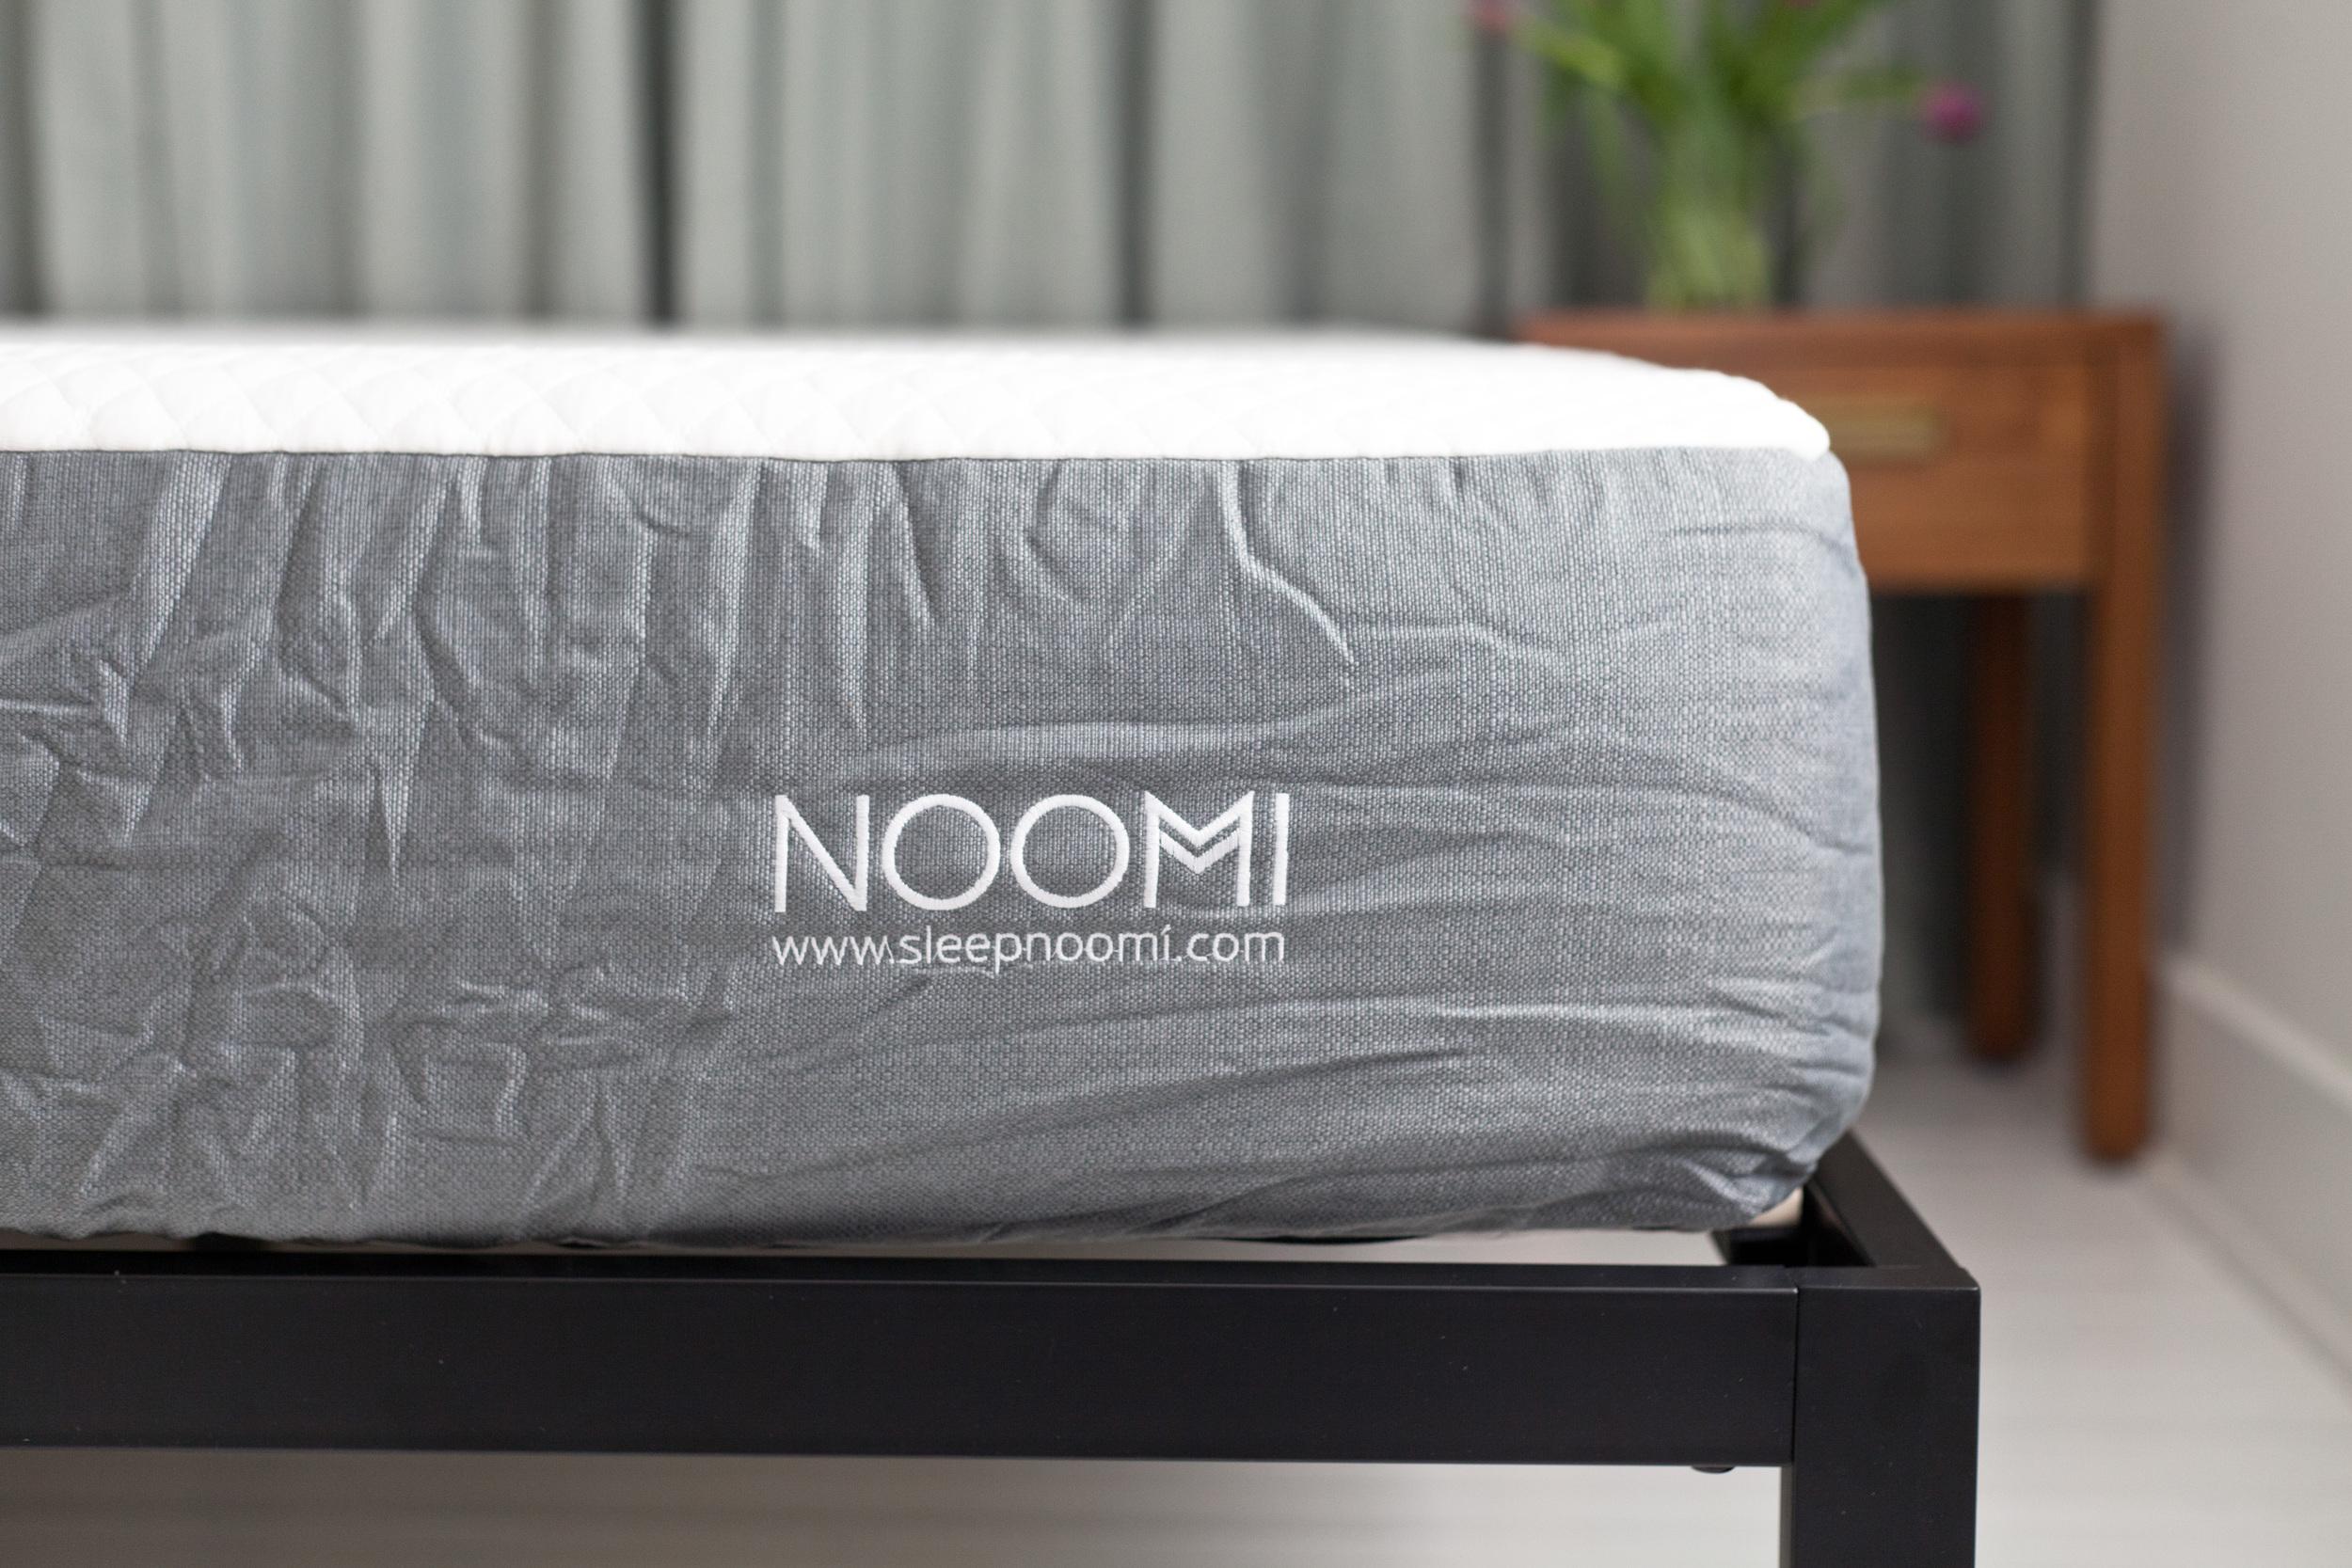 Minimalist Master Bedroom Redo: Sleep, Health, and A Magical New Mattress (Noomi)